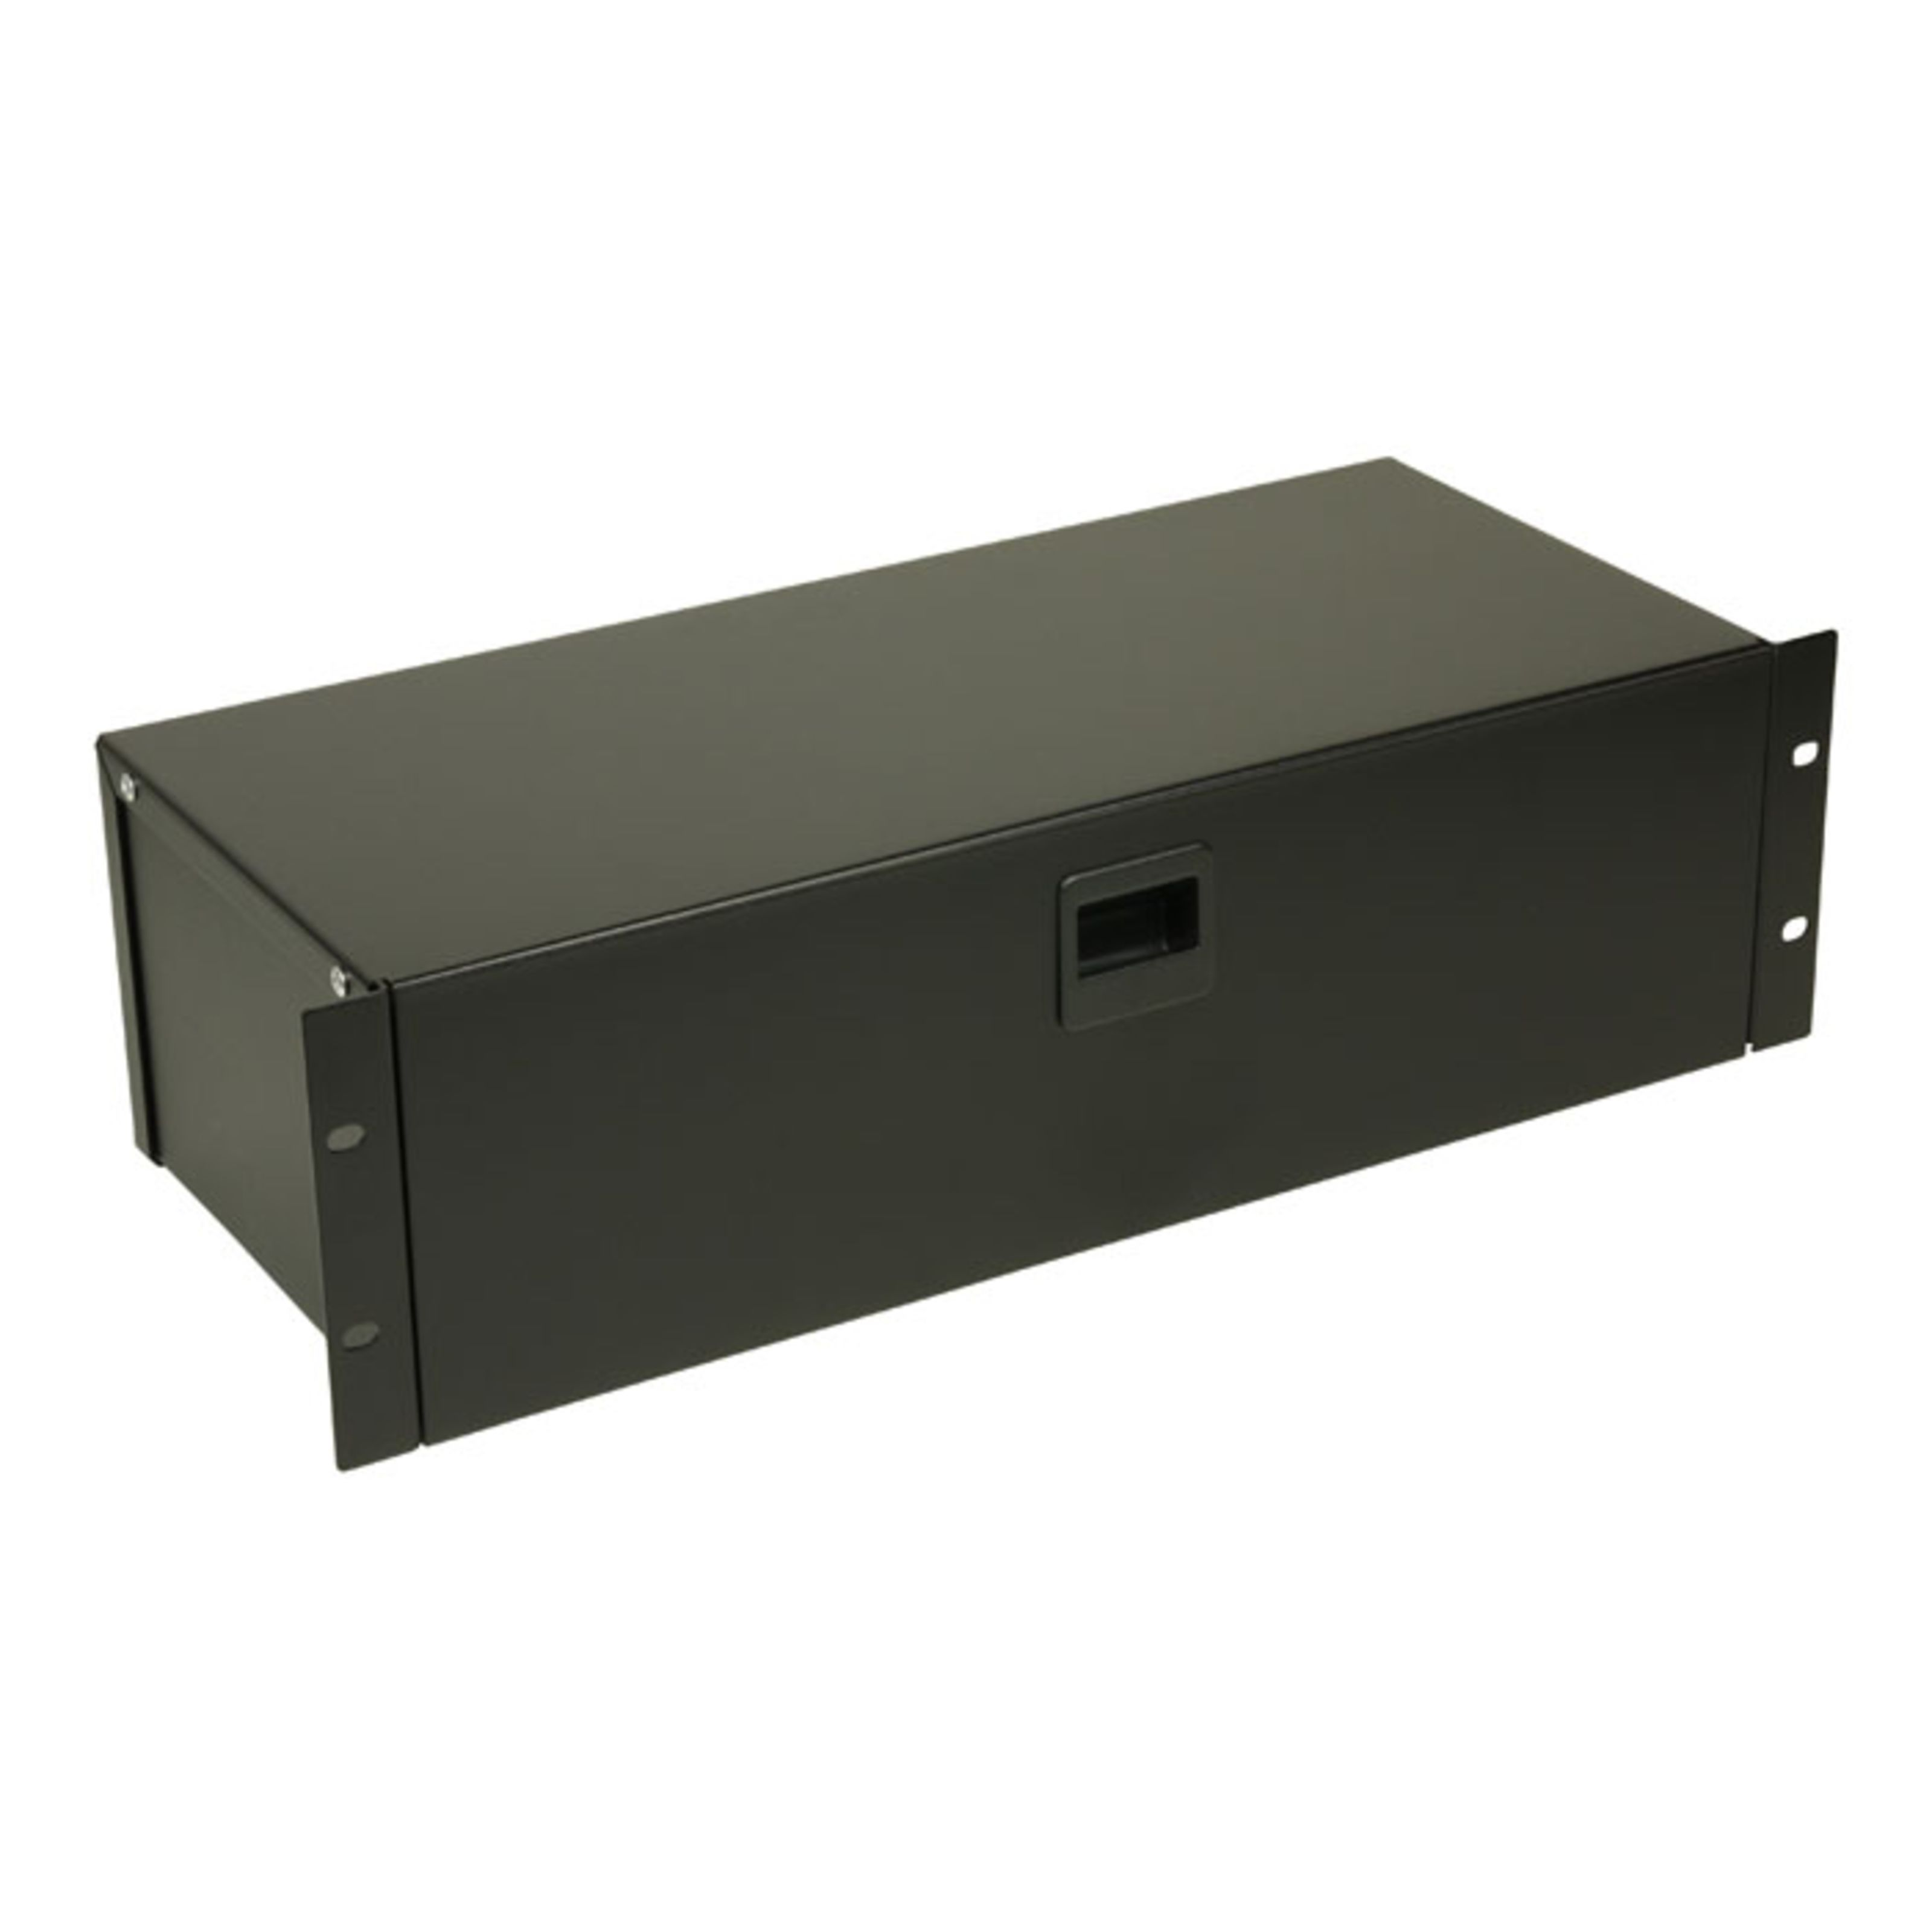 Adam Hall - 87302 - 19 Rackbox 2HE mit Schnappverschluss